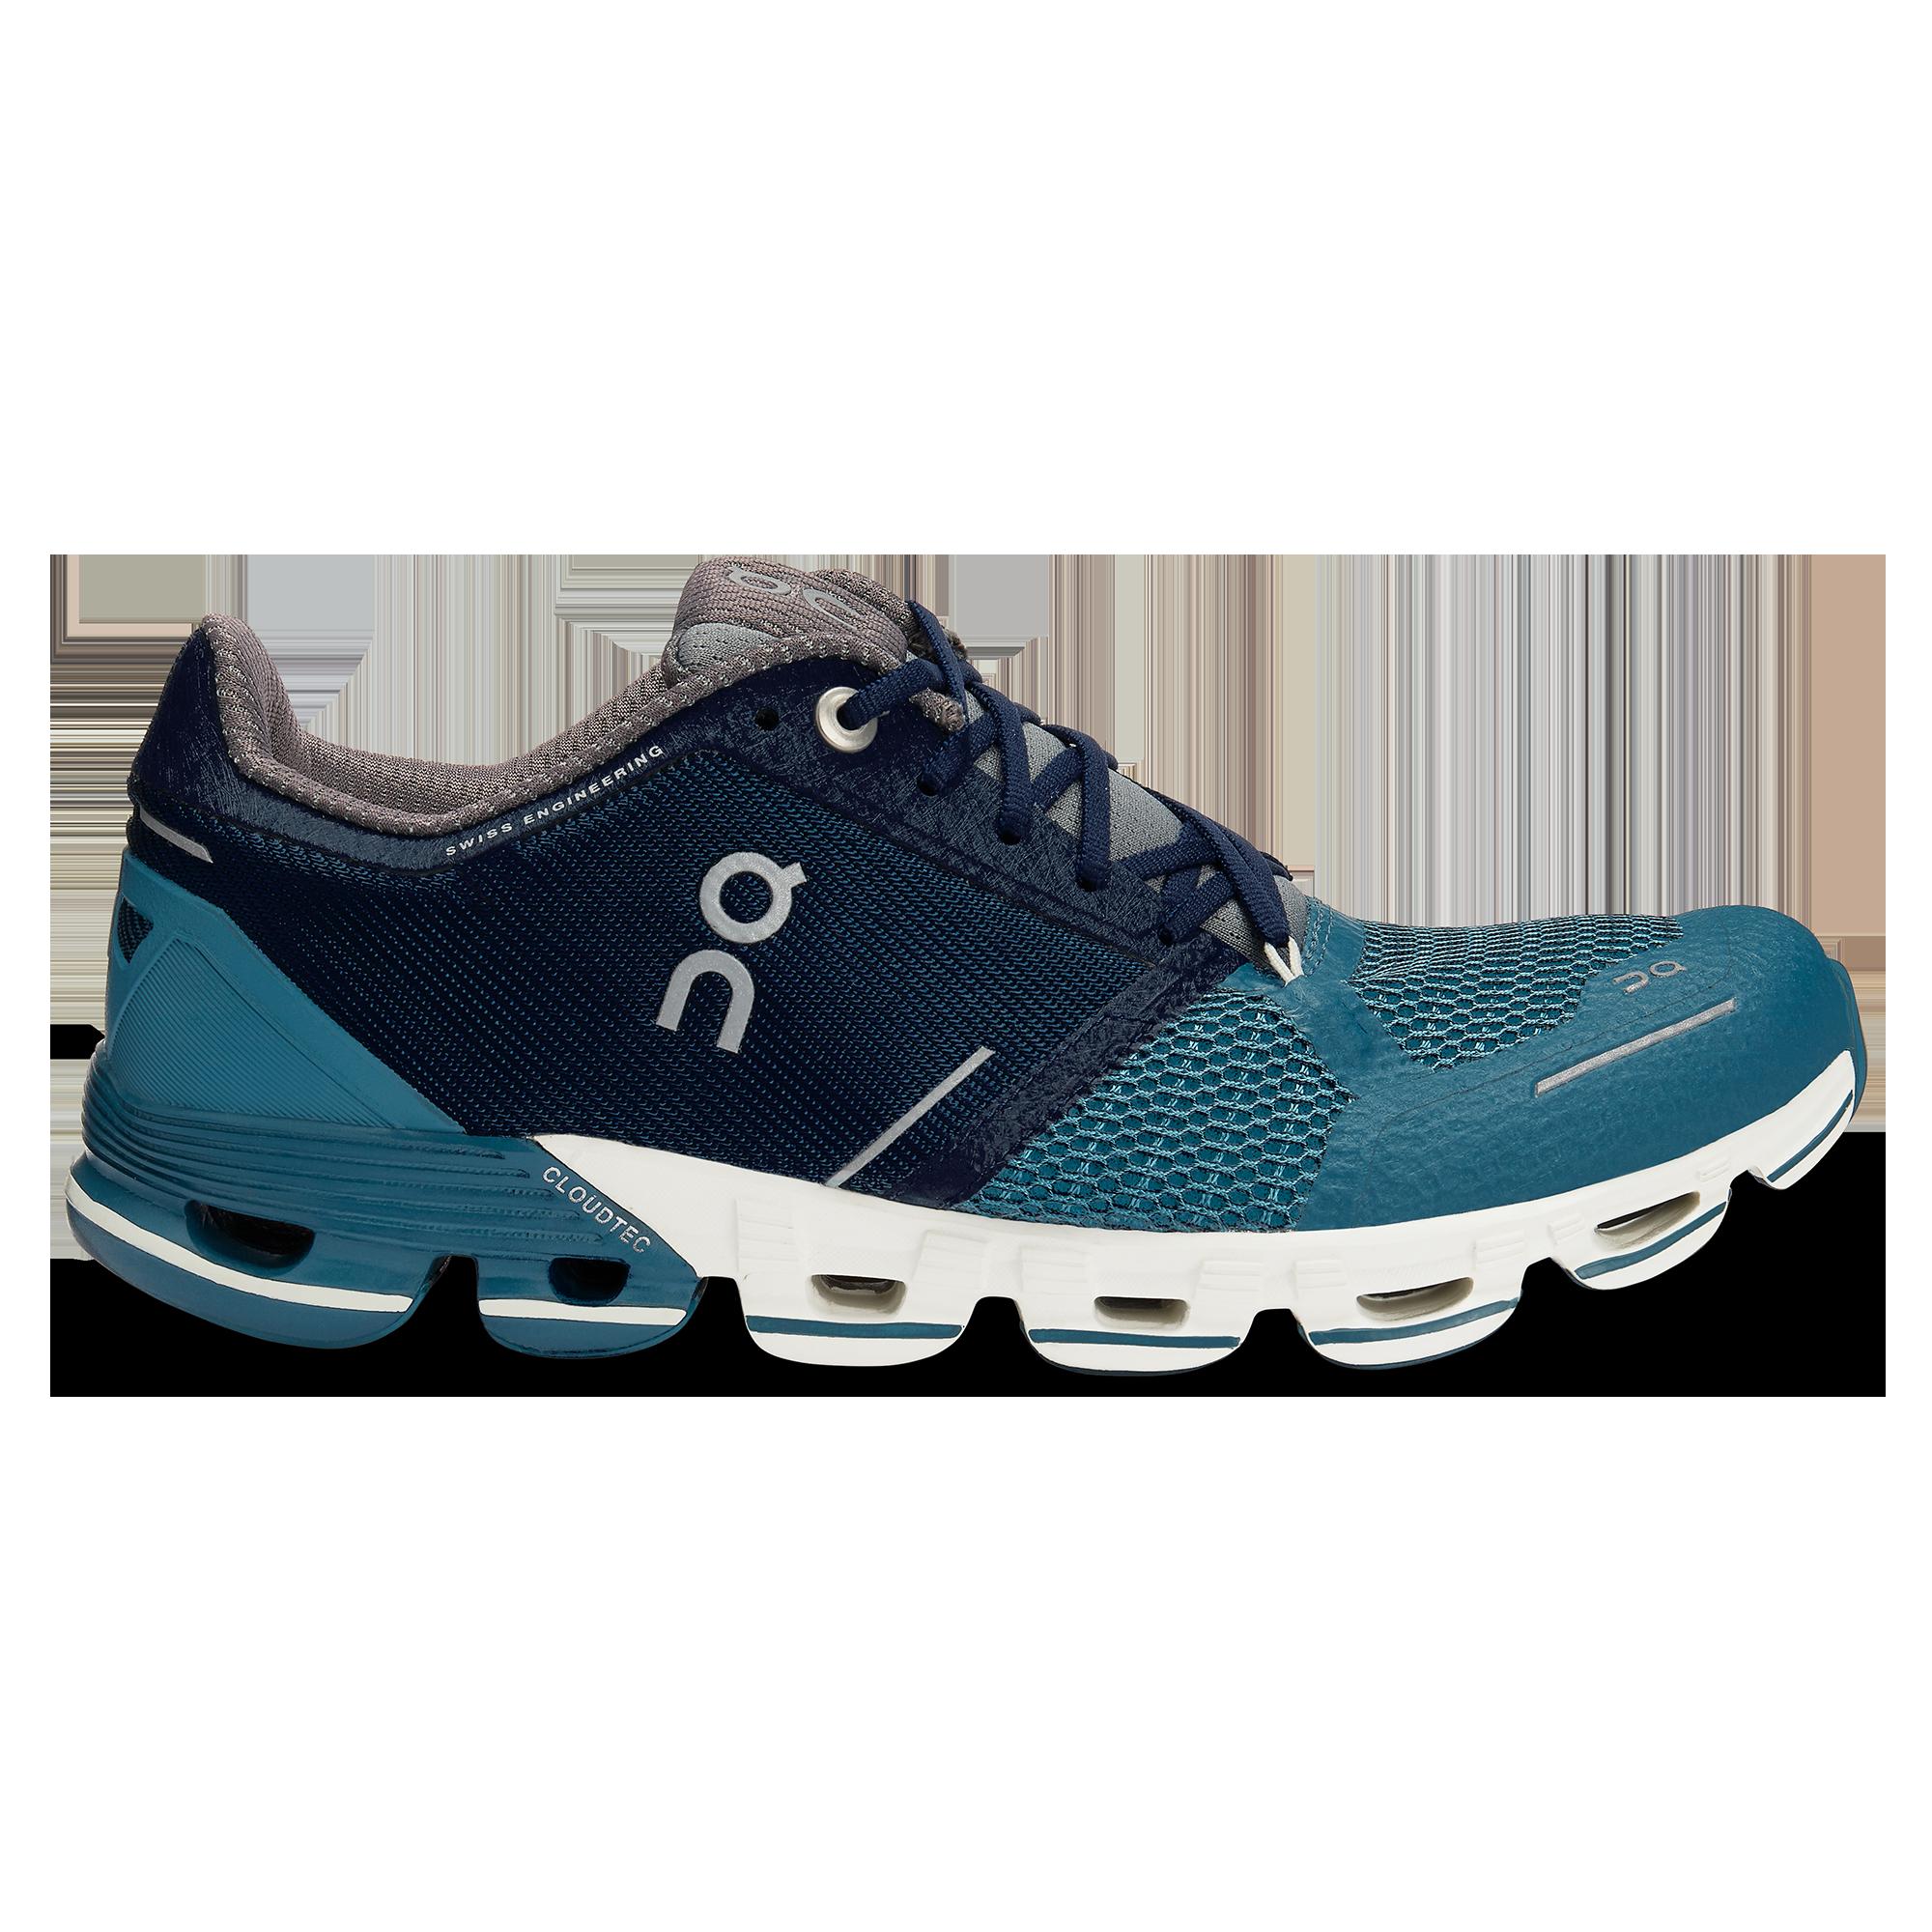 Cloudflyer Lightweight Stability Running Shoe | On